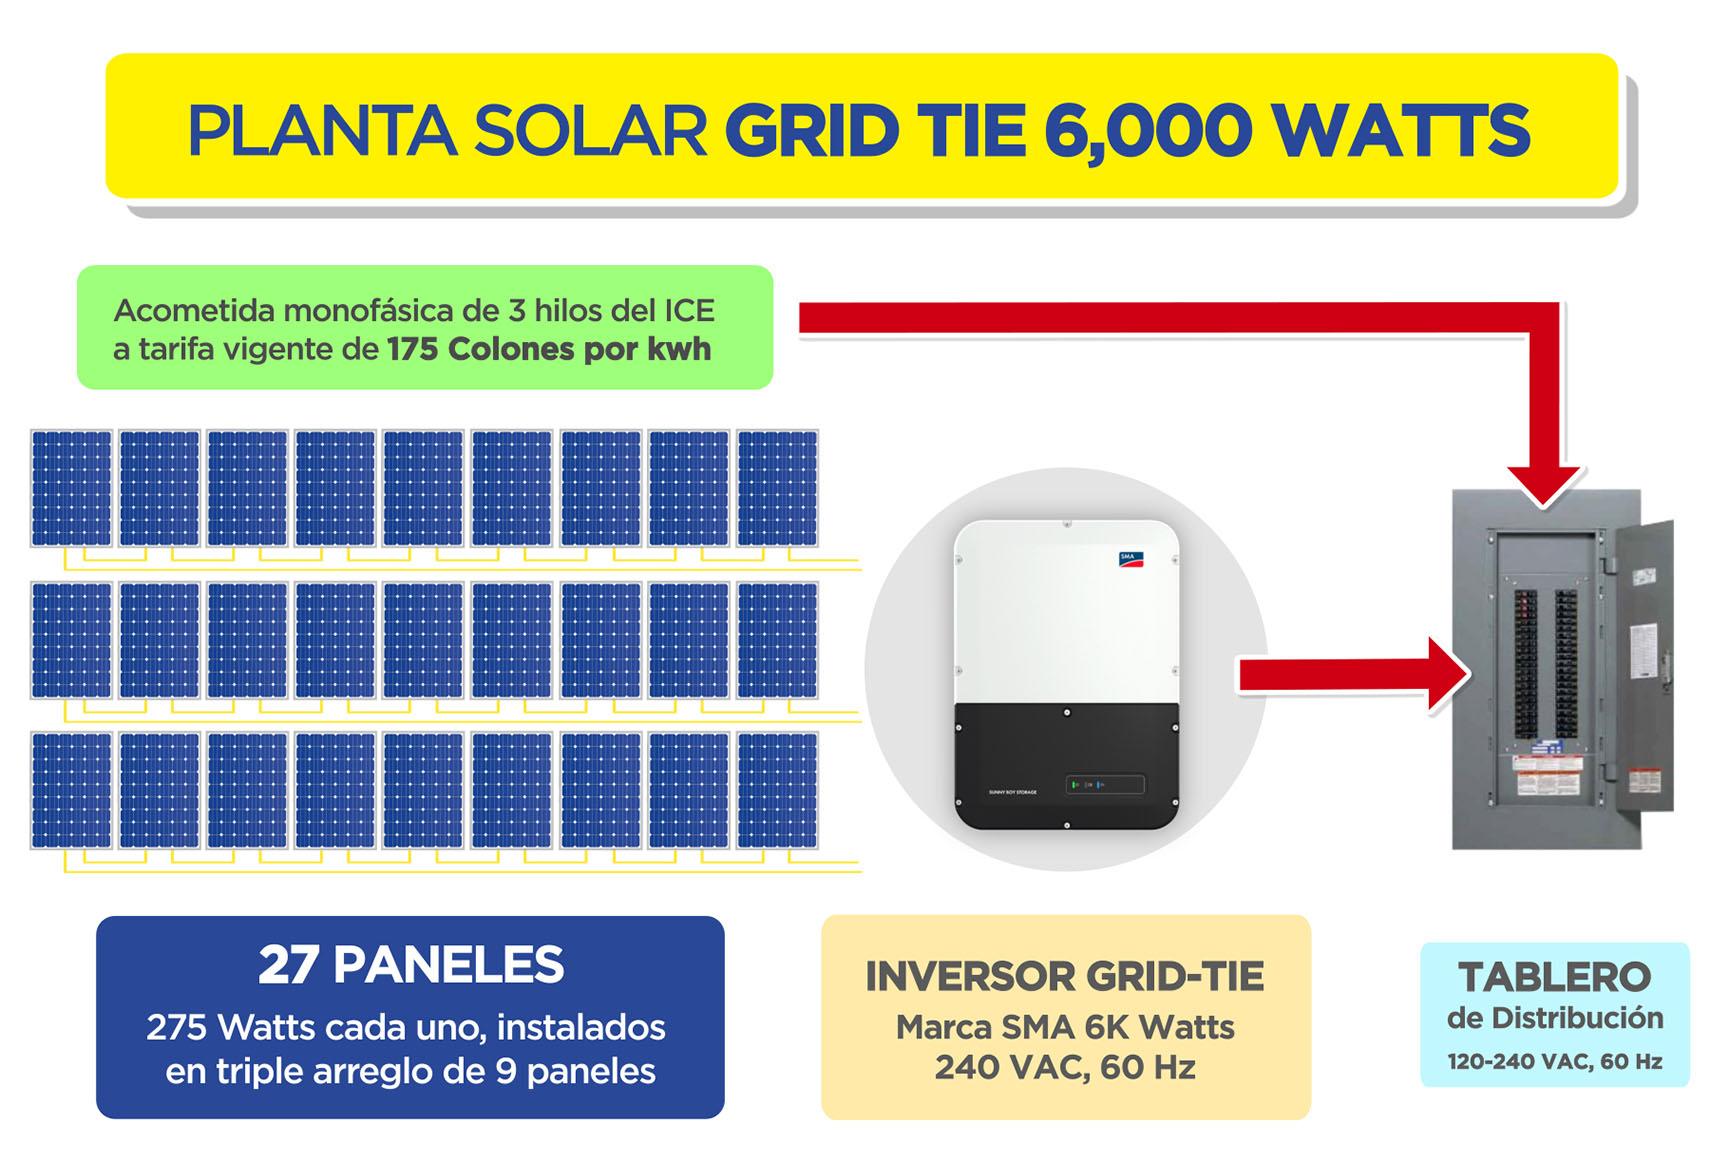 PLANTA SOLAR GRID TIE 6,000 Watts